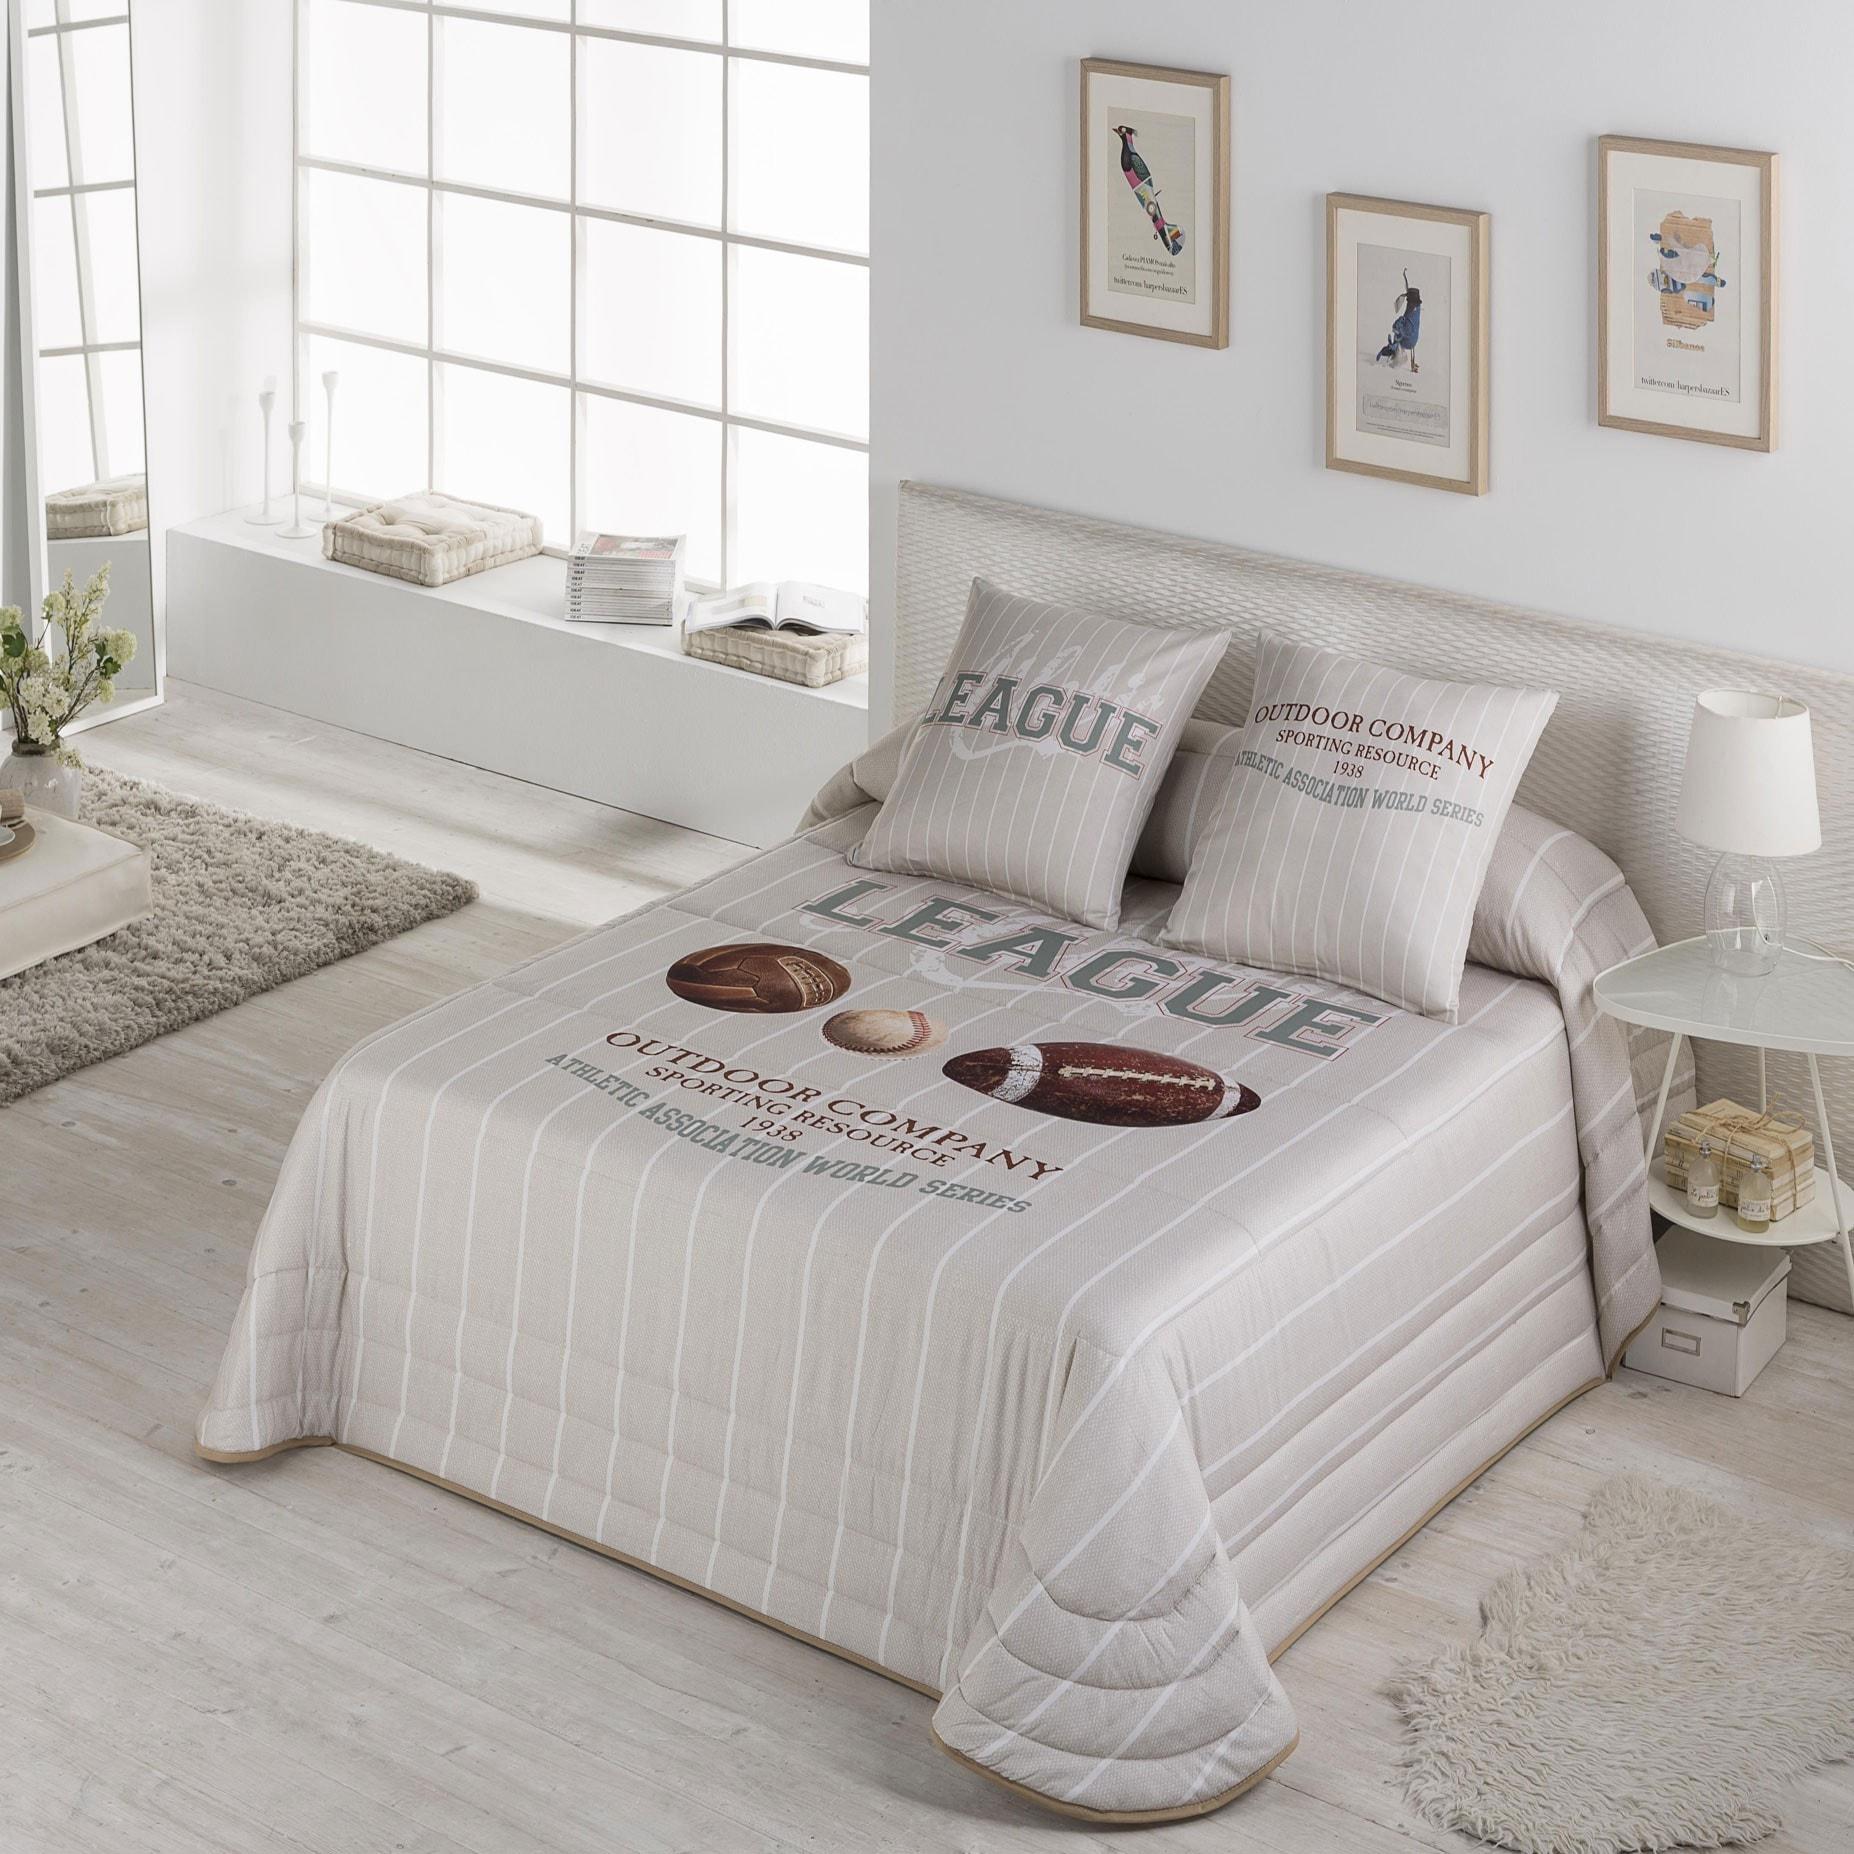 Colchas originales para dormitorios infantiles colch n expr s - Colchas para sofas baratas ...